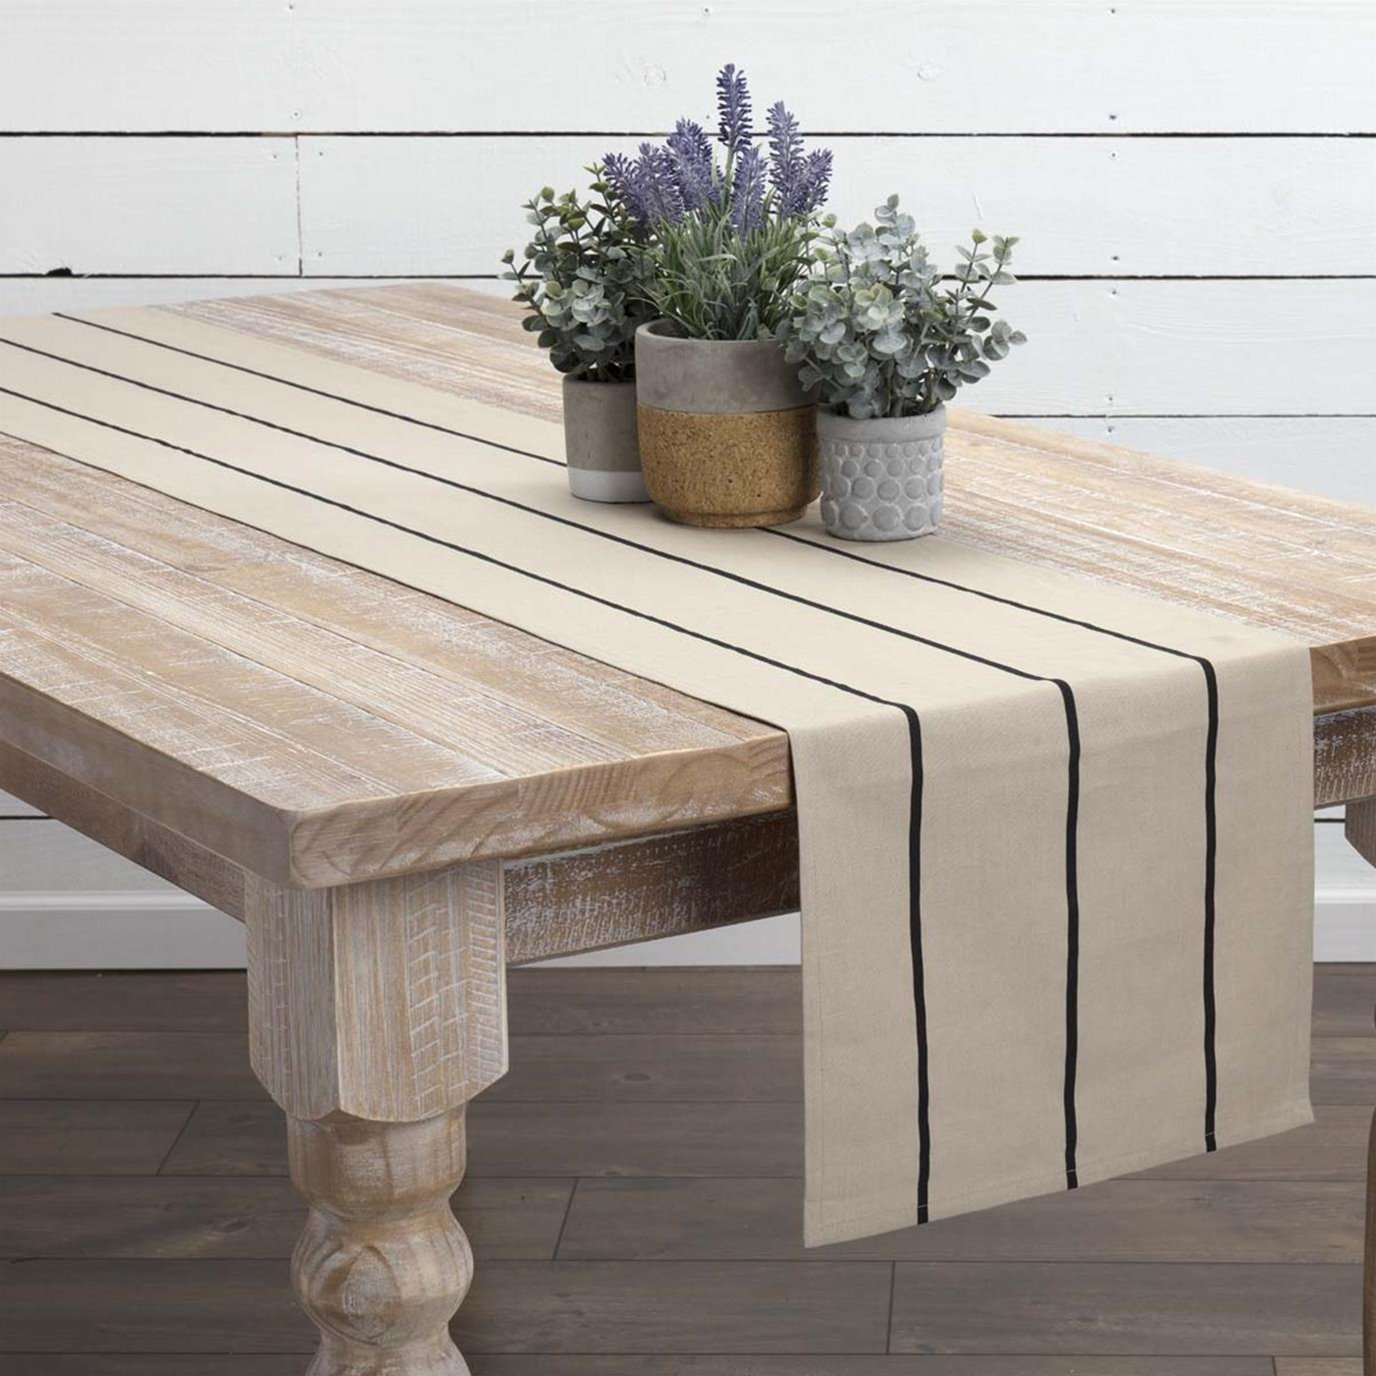 Tabletop & Kitchen